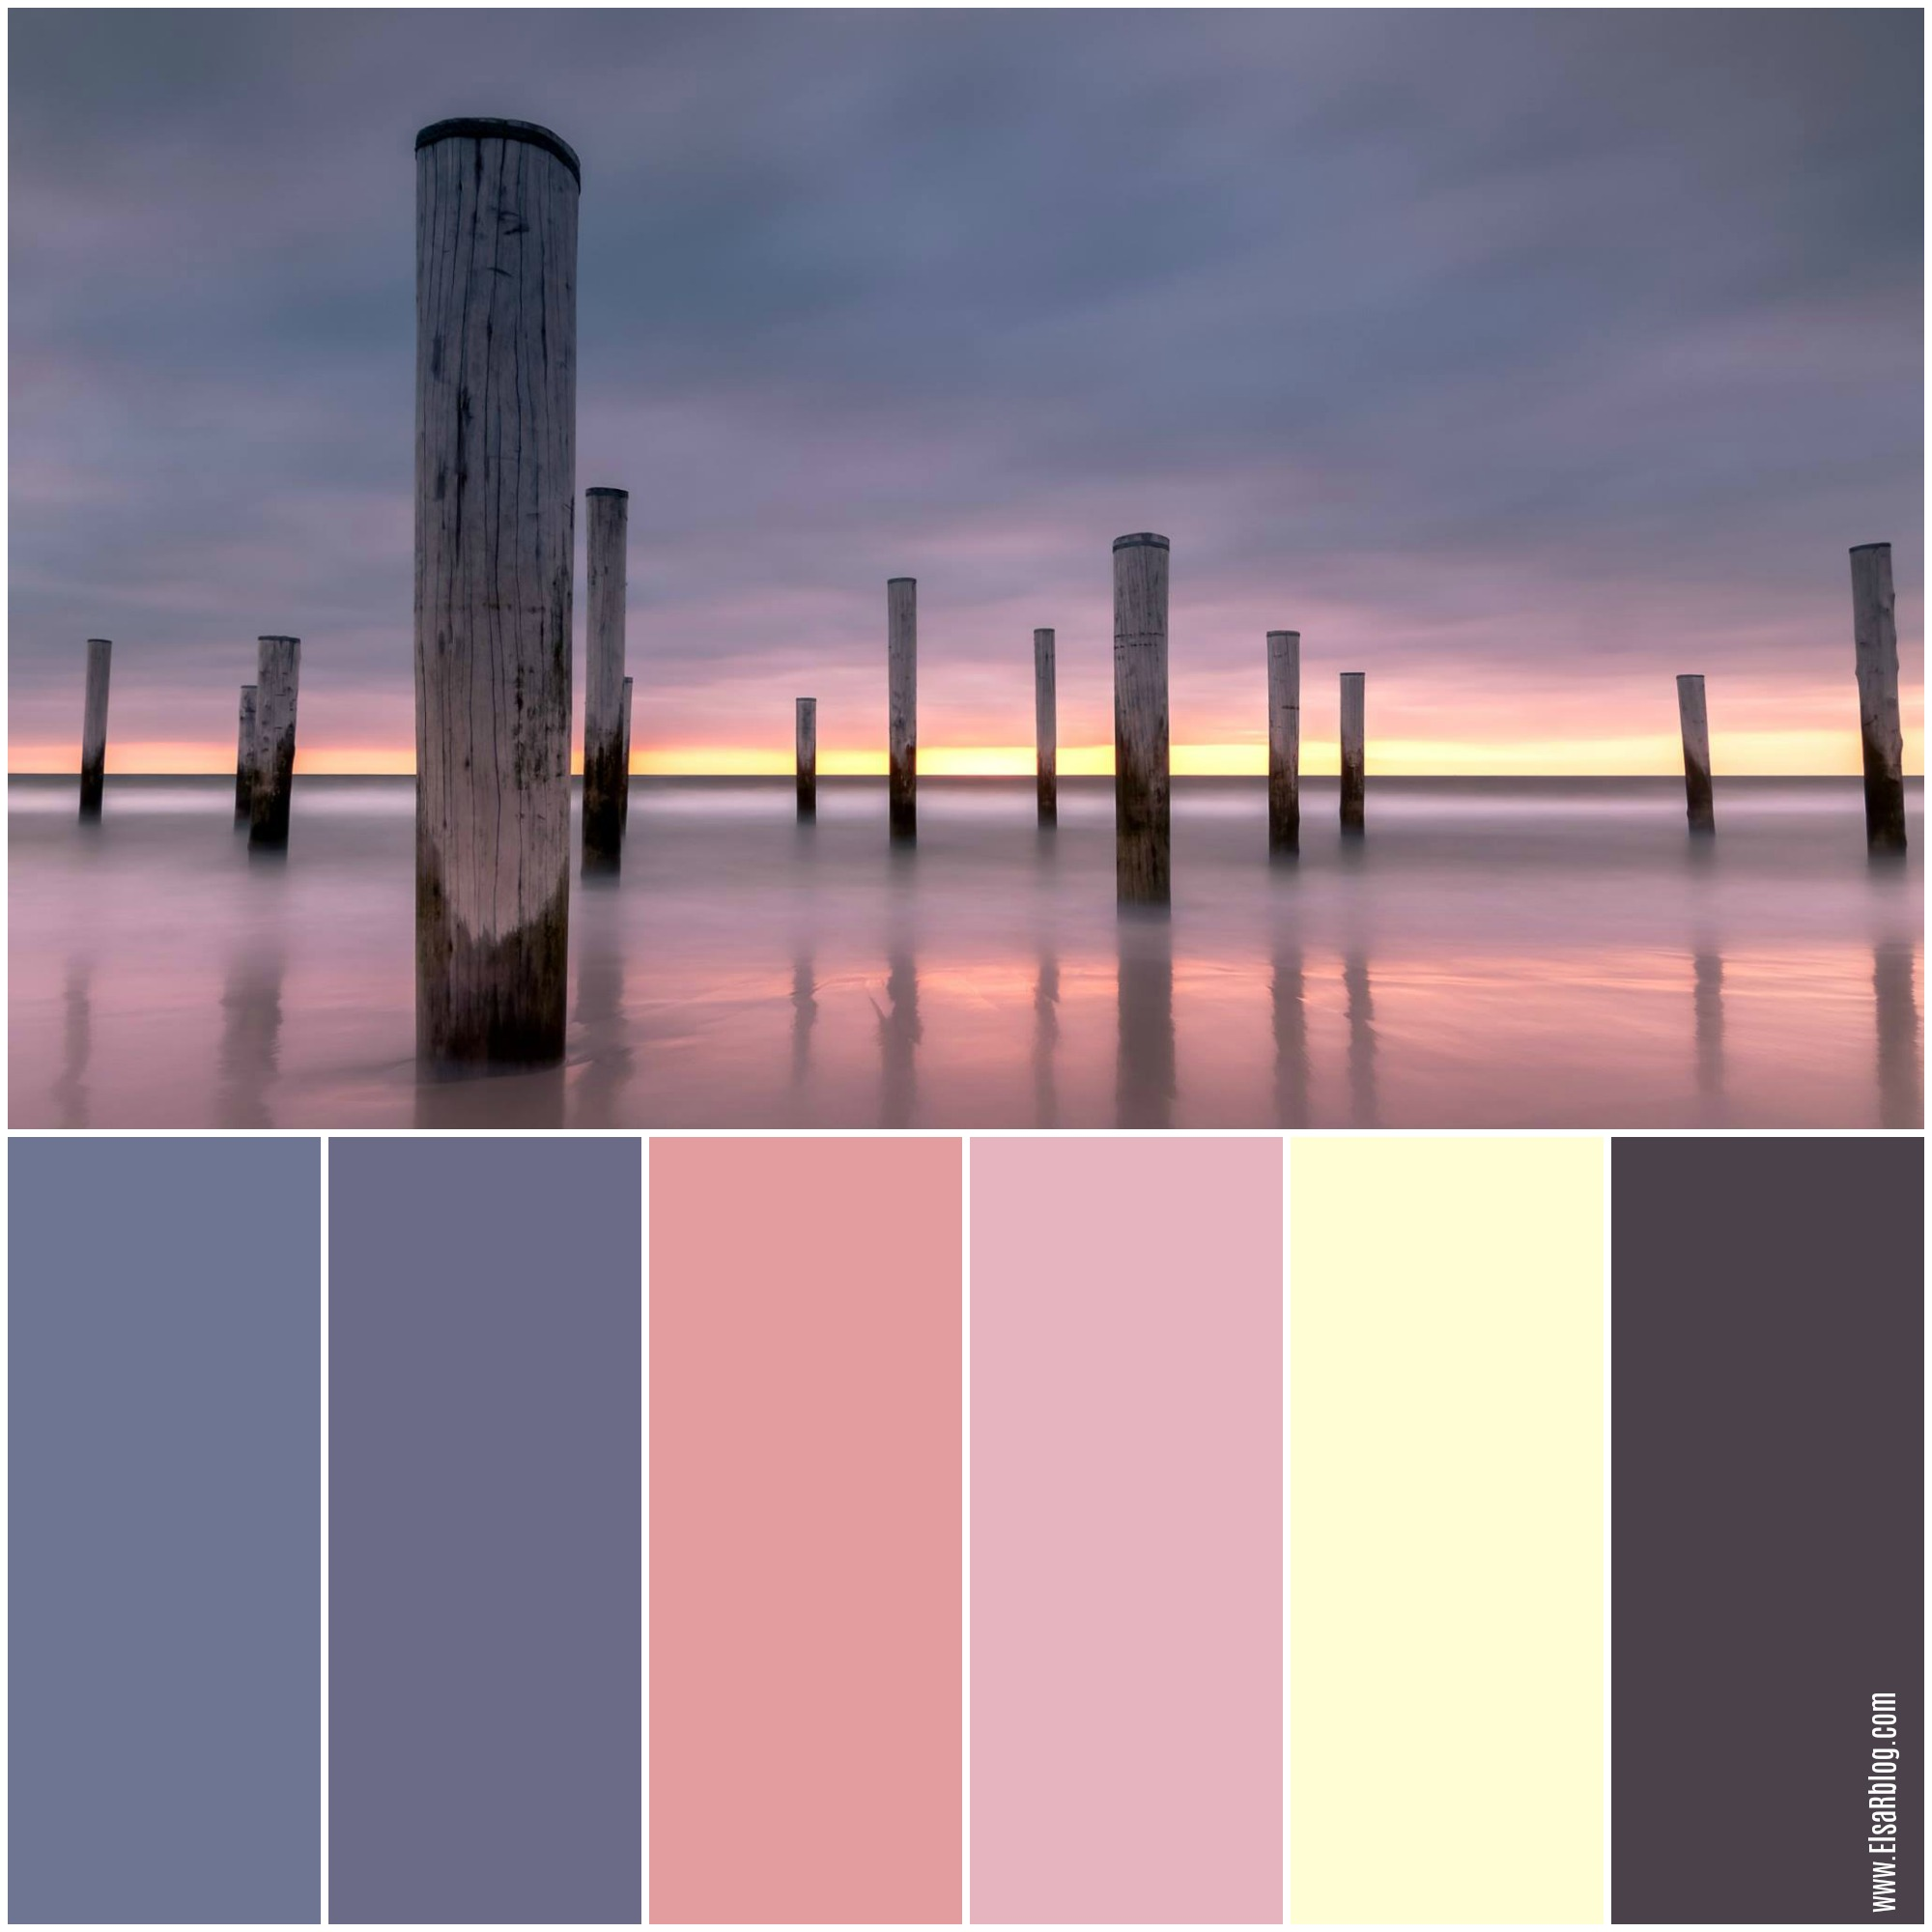 kleurenpalet met vintage blauw, warm beige, oud roze en donker bruin